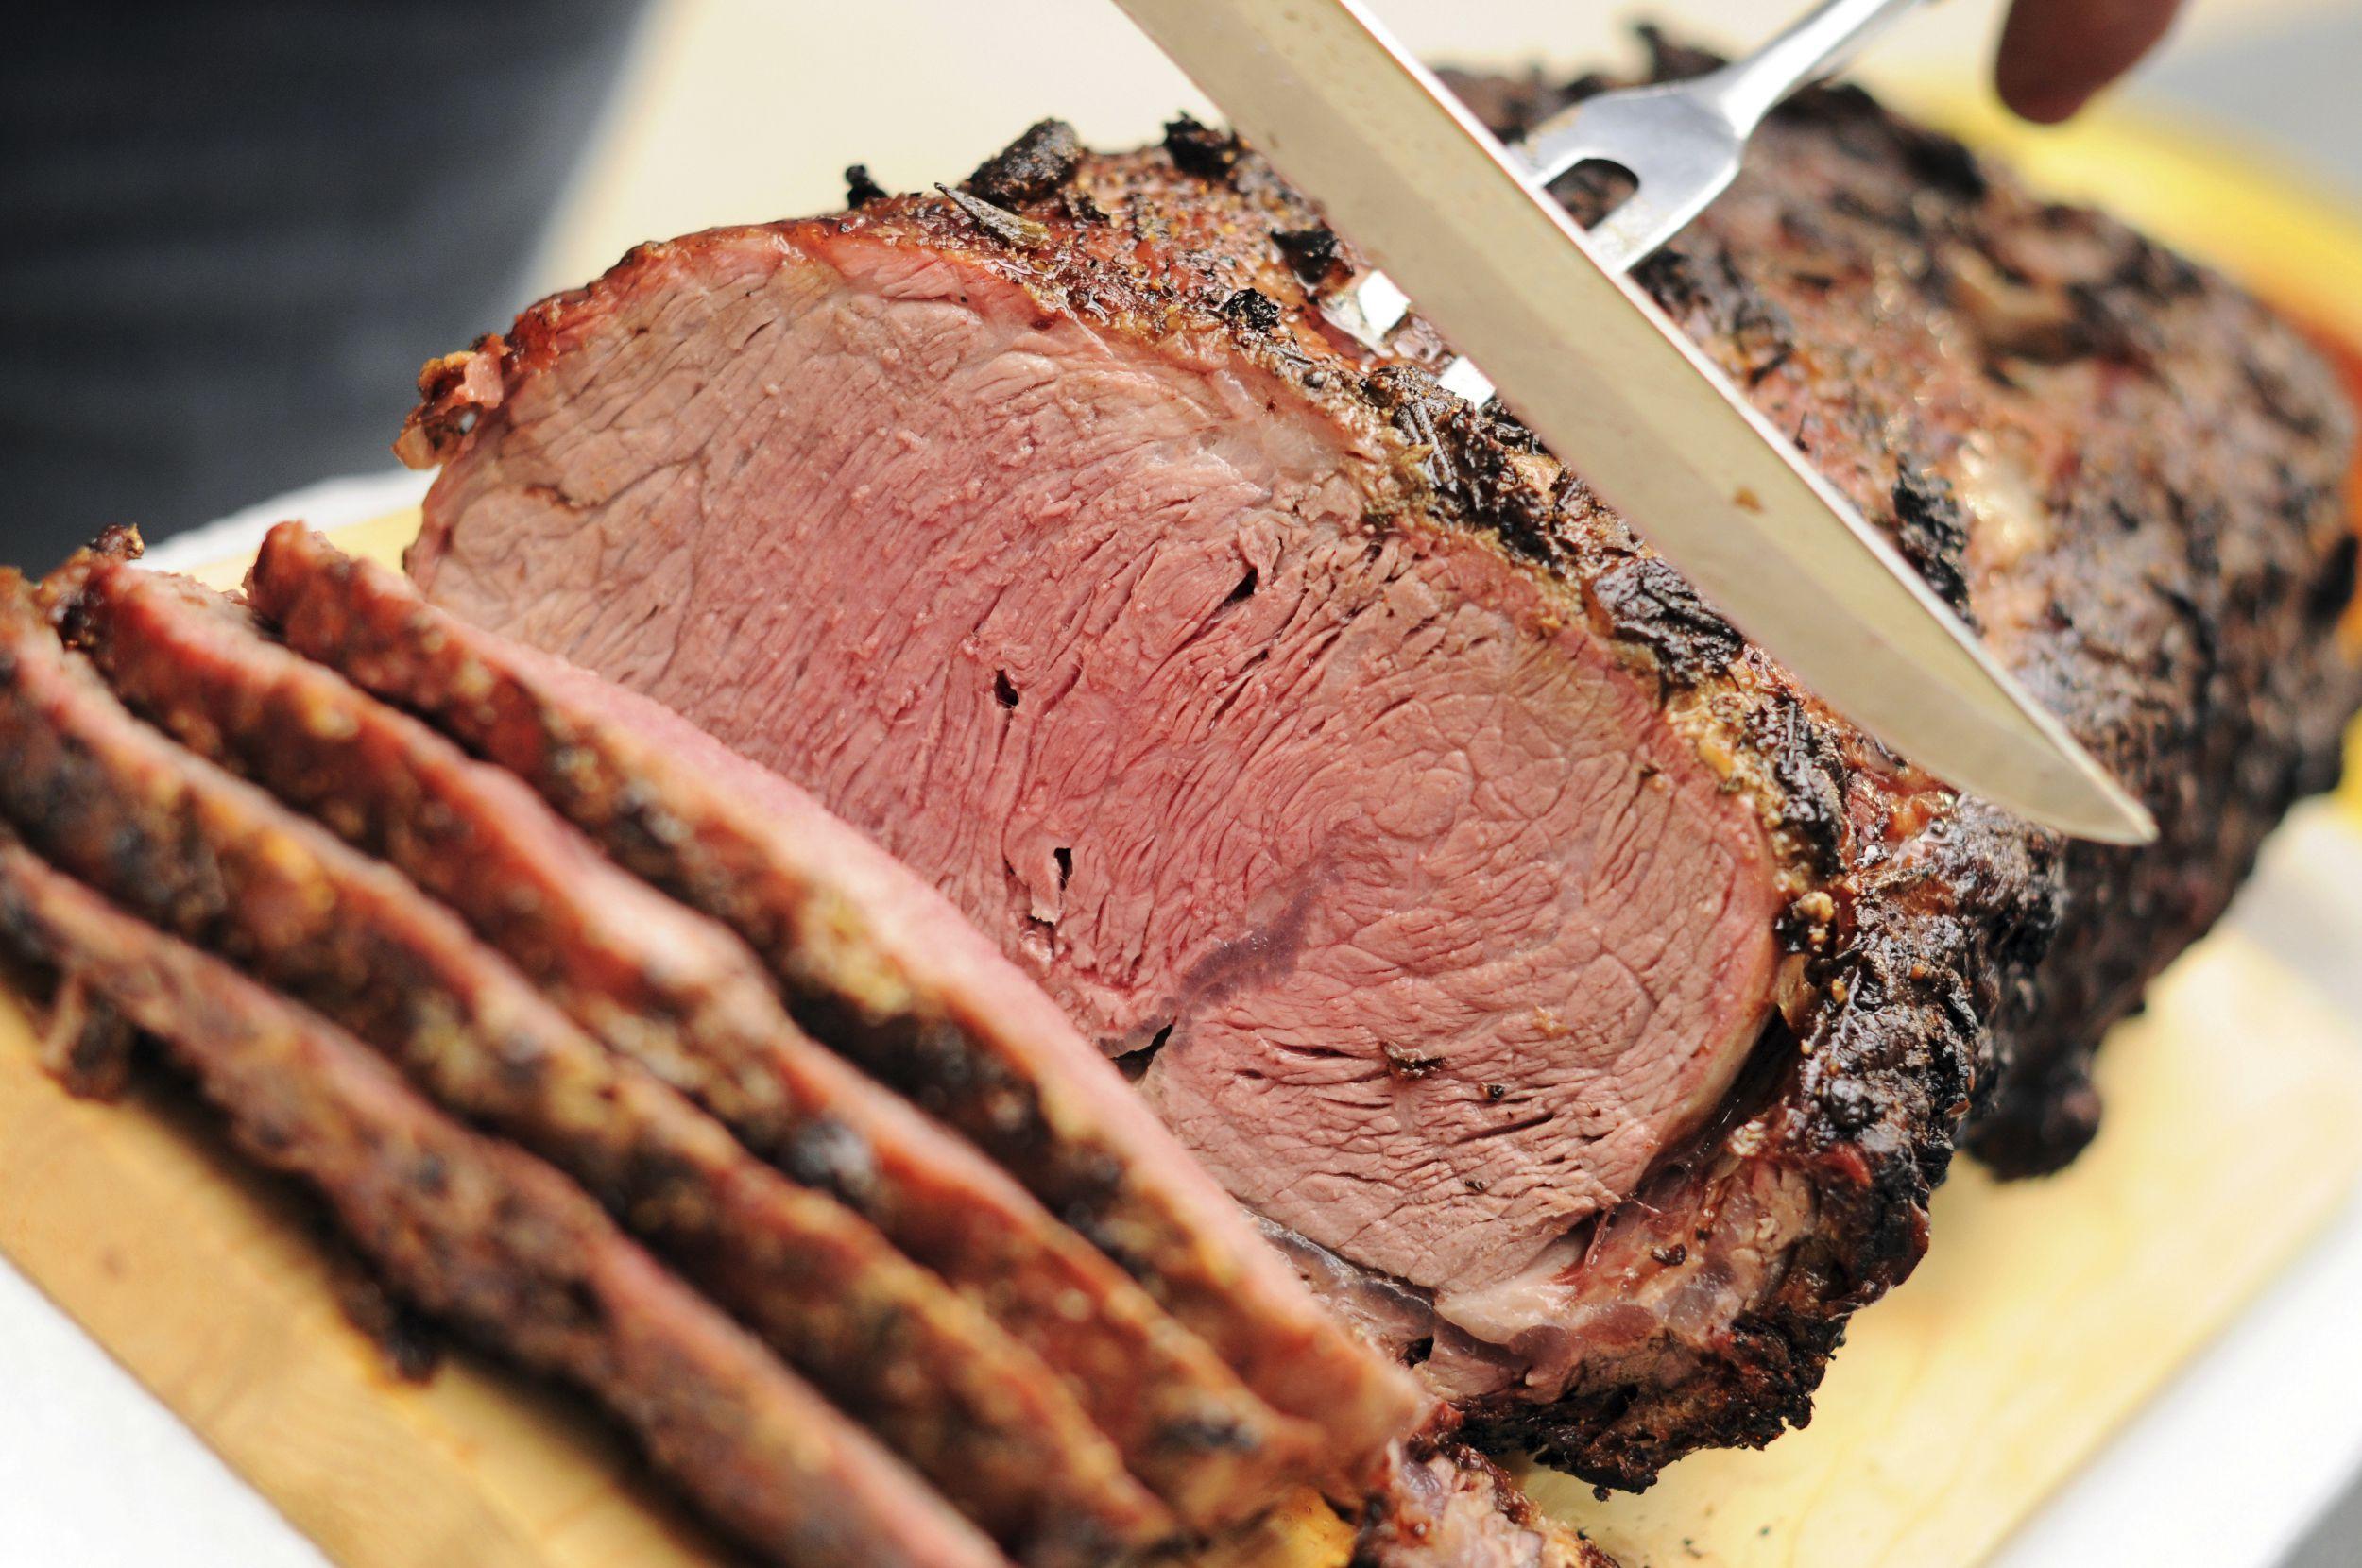 Turkey Cook Time Per Pound >> prime rib cooking time per pound calculator